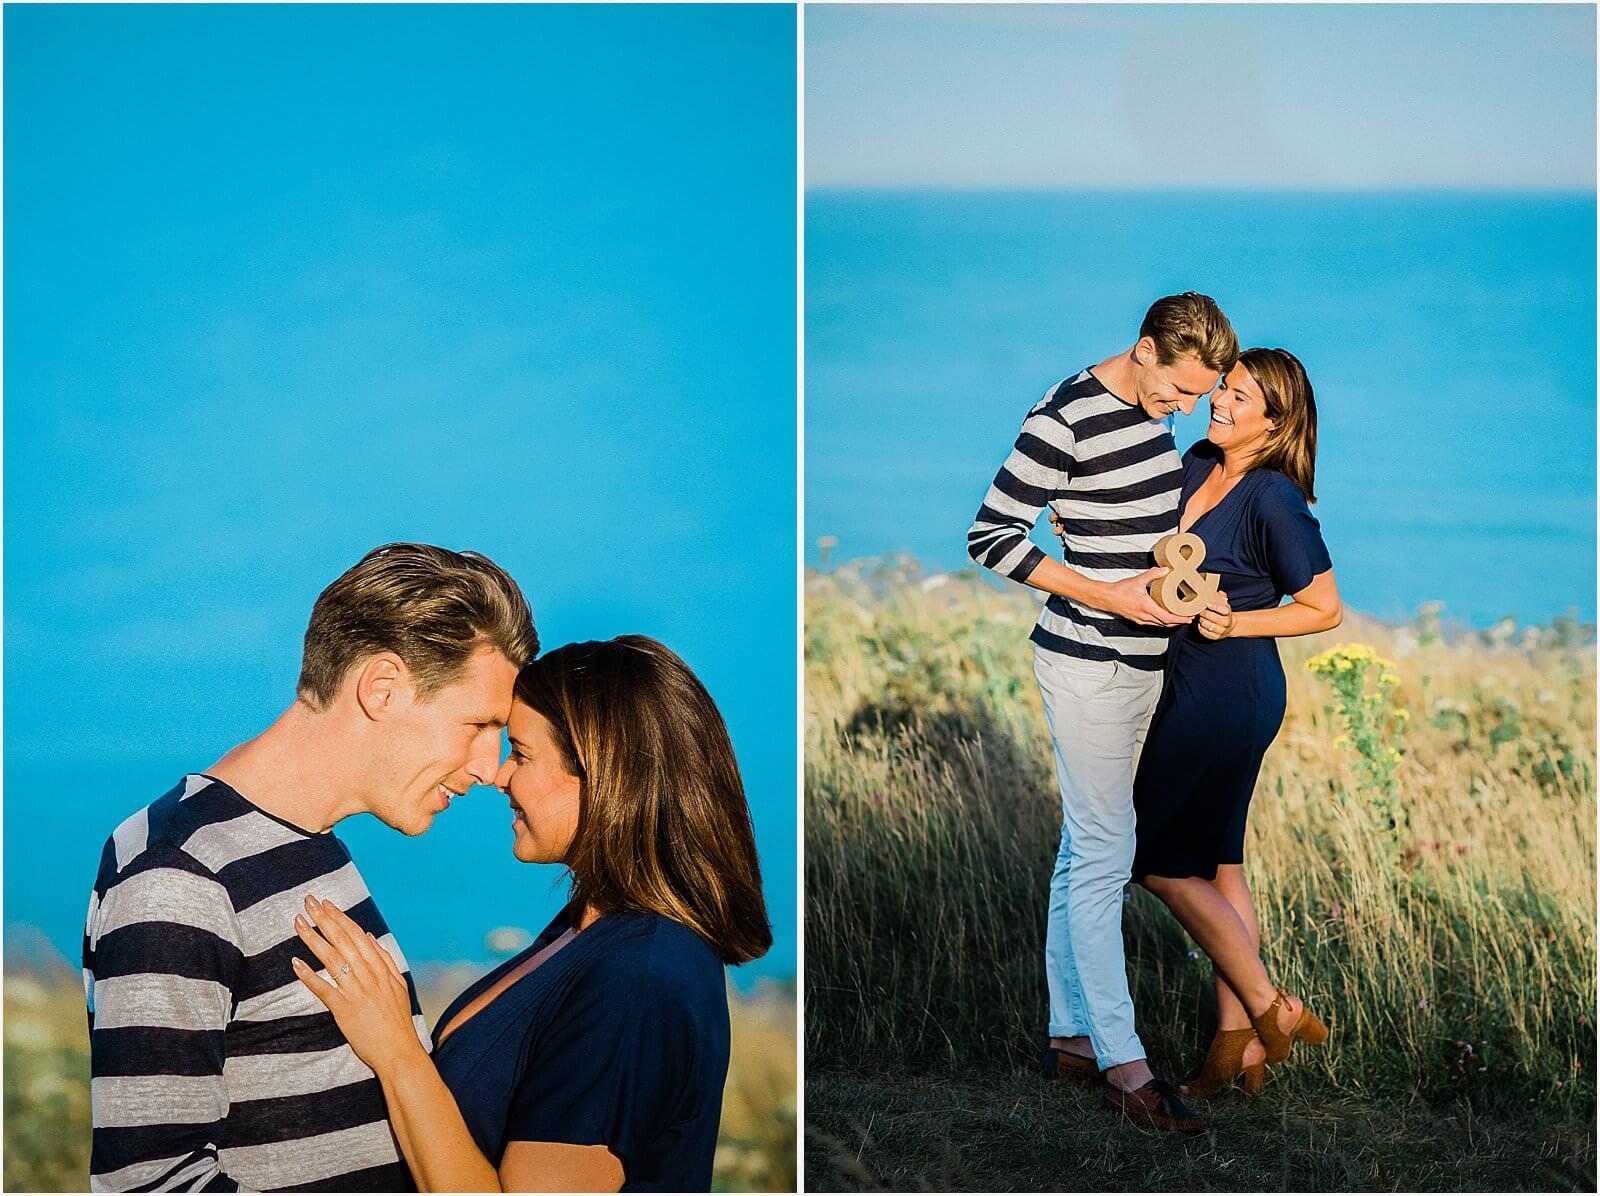 Eastbourne Engagement | Chantel & Evan 2